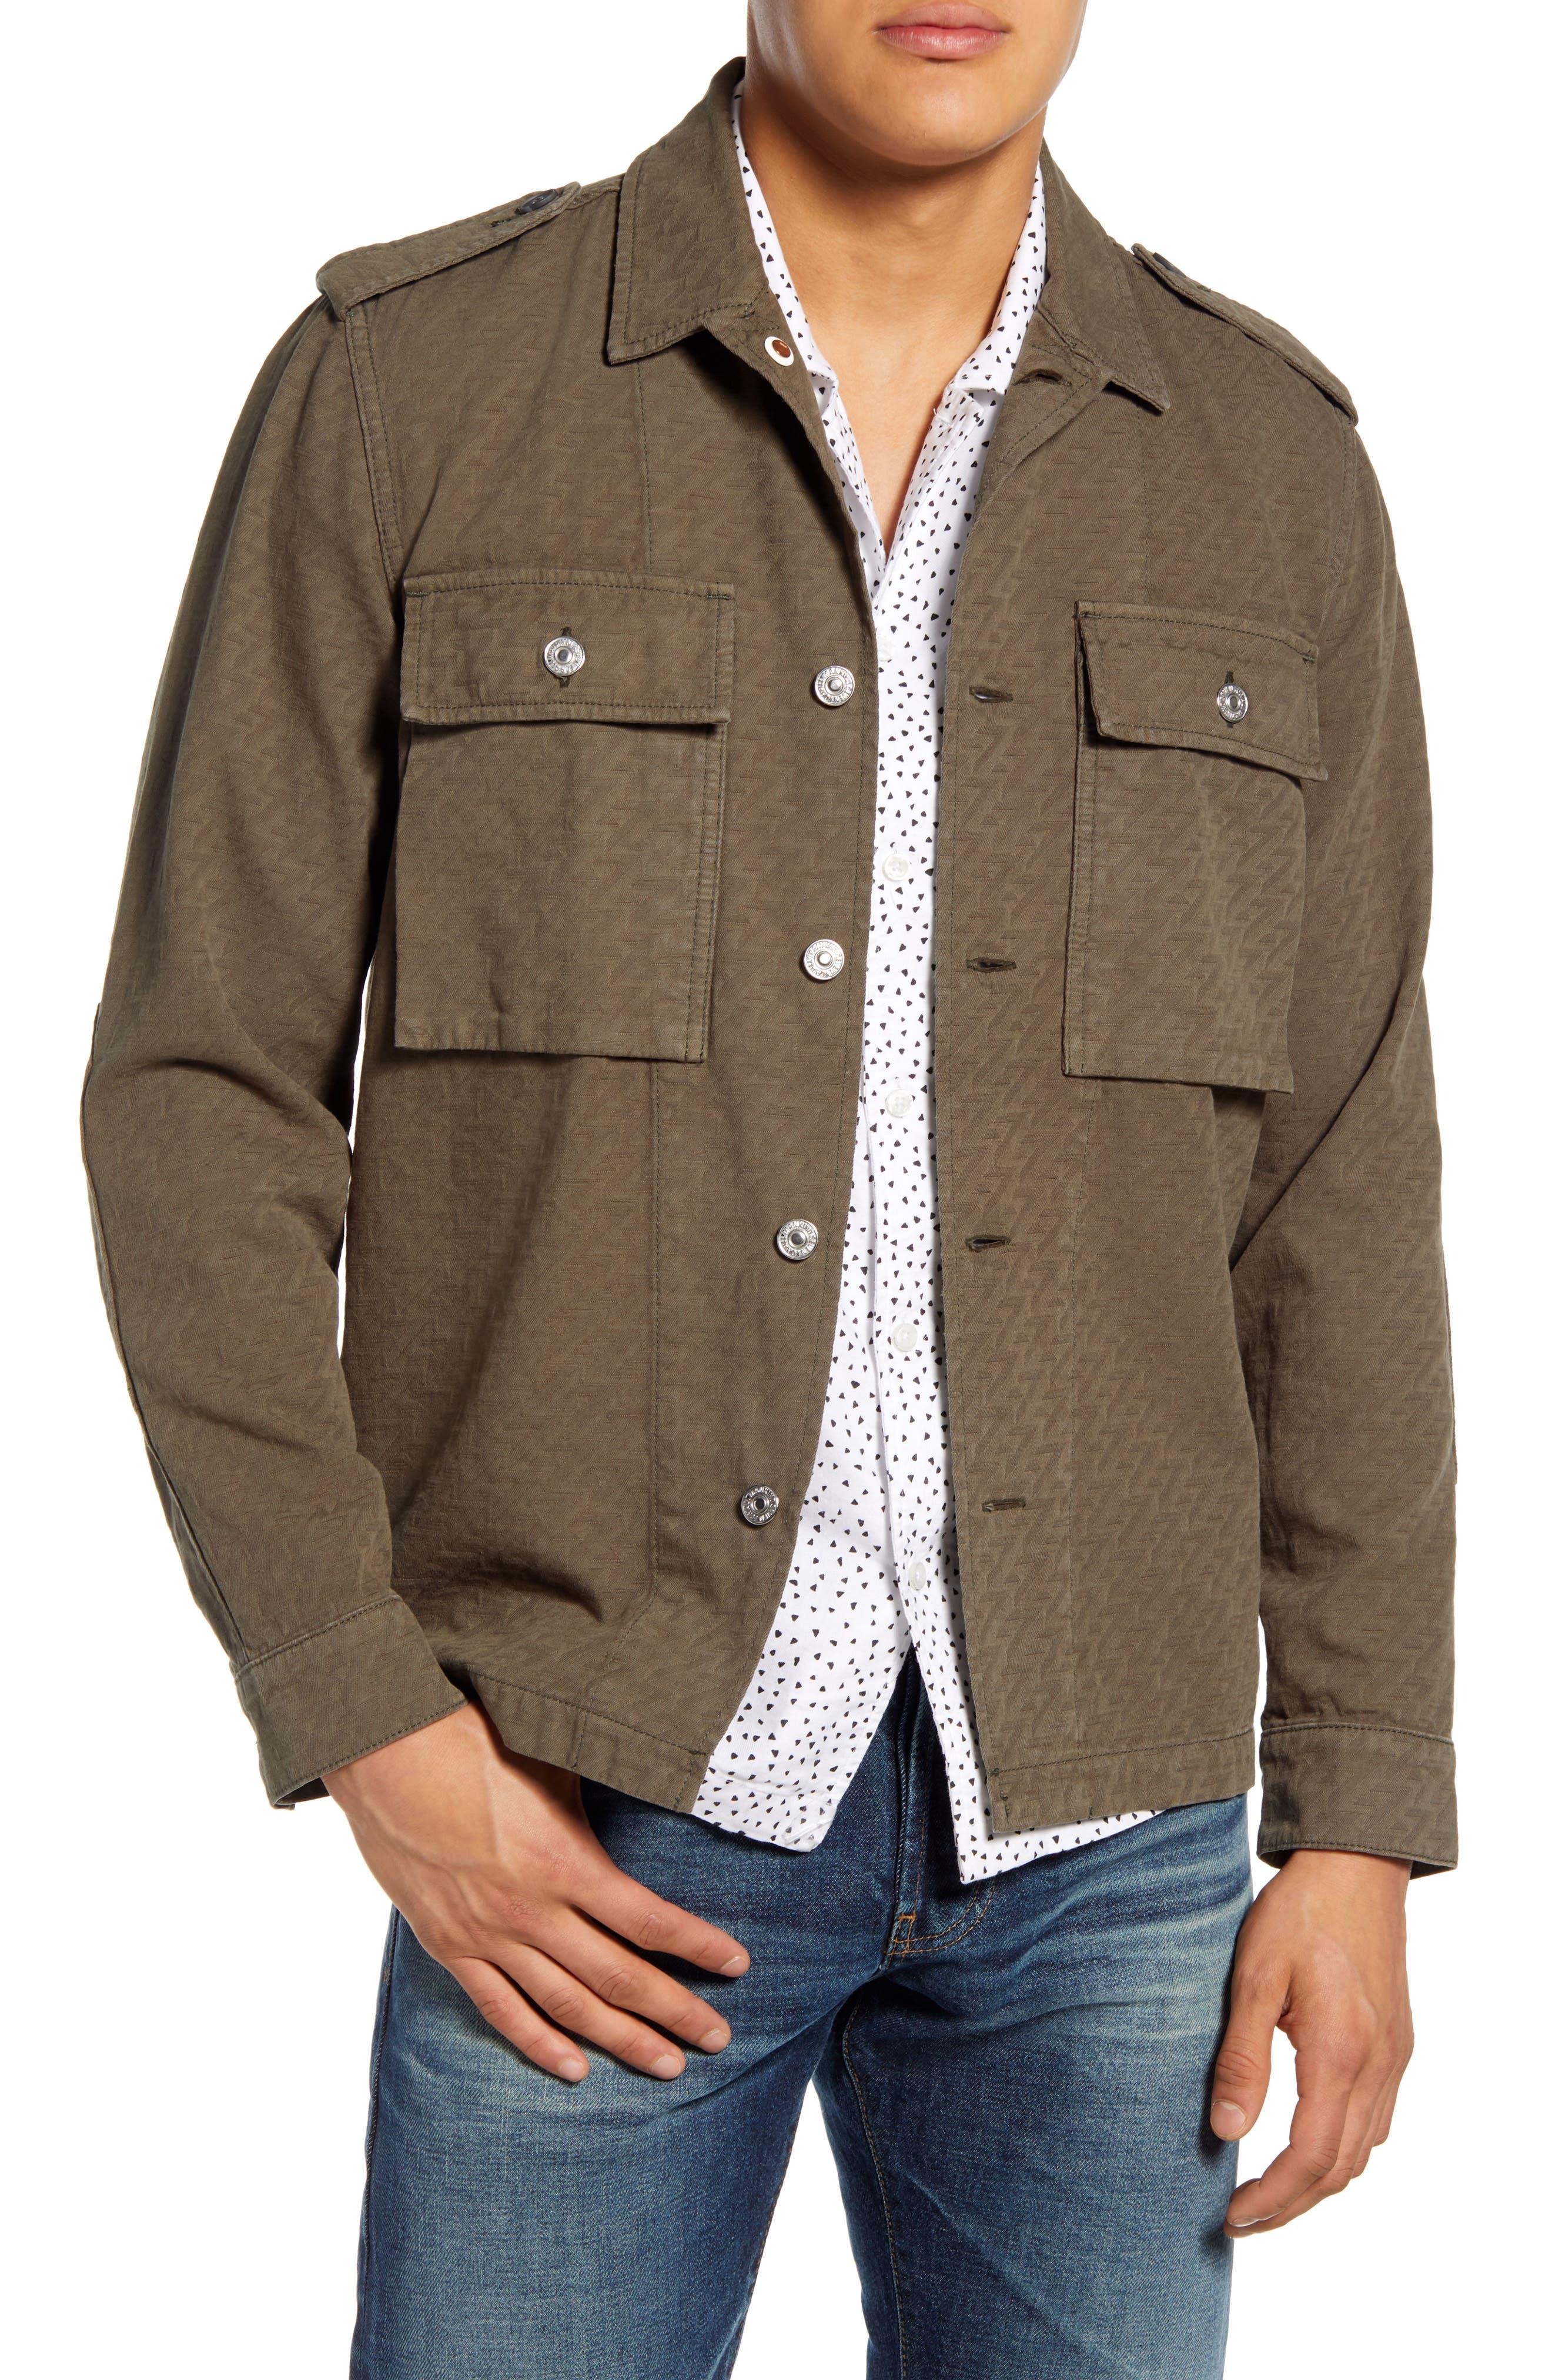 Image of 7 For All Mankind Zigzag Jacquard Military Shirt Jacket